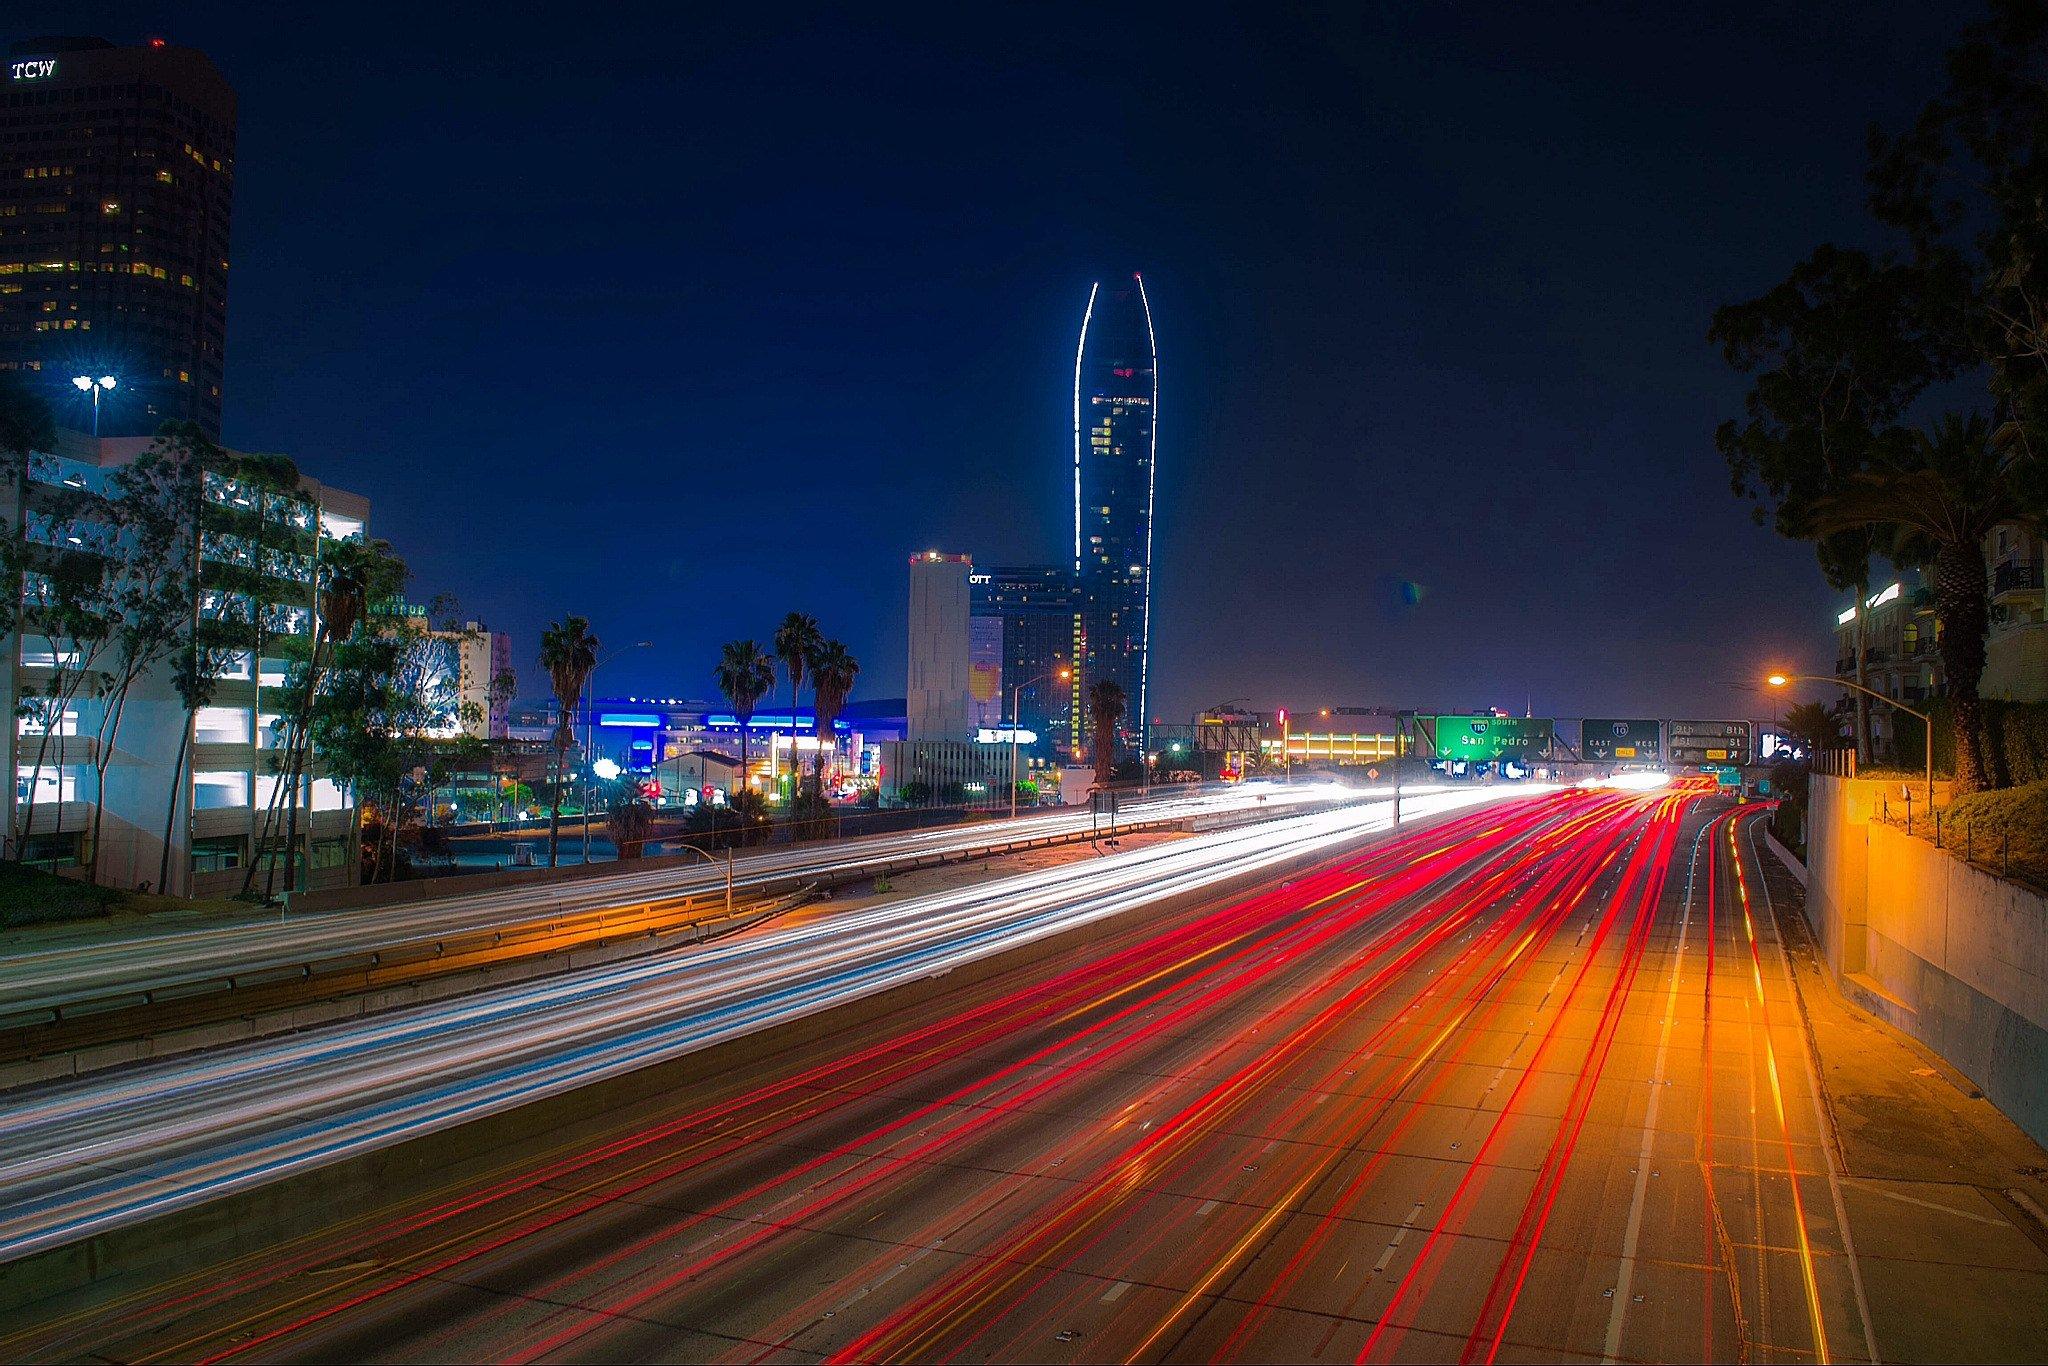 Картинки ночного города лос анджелеса